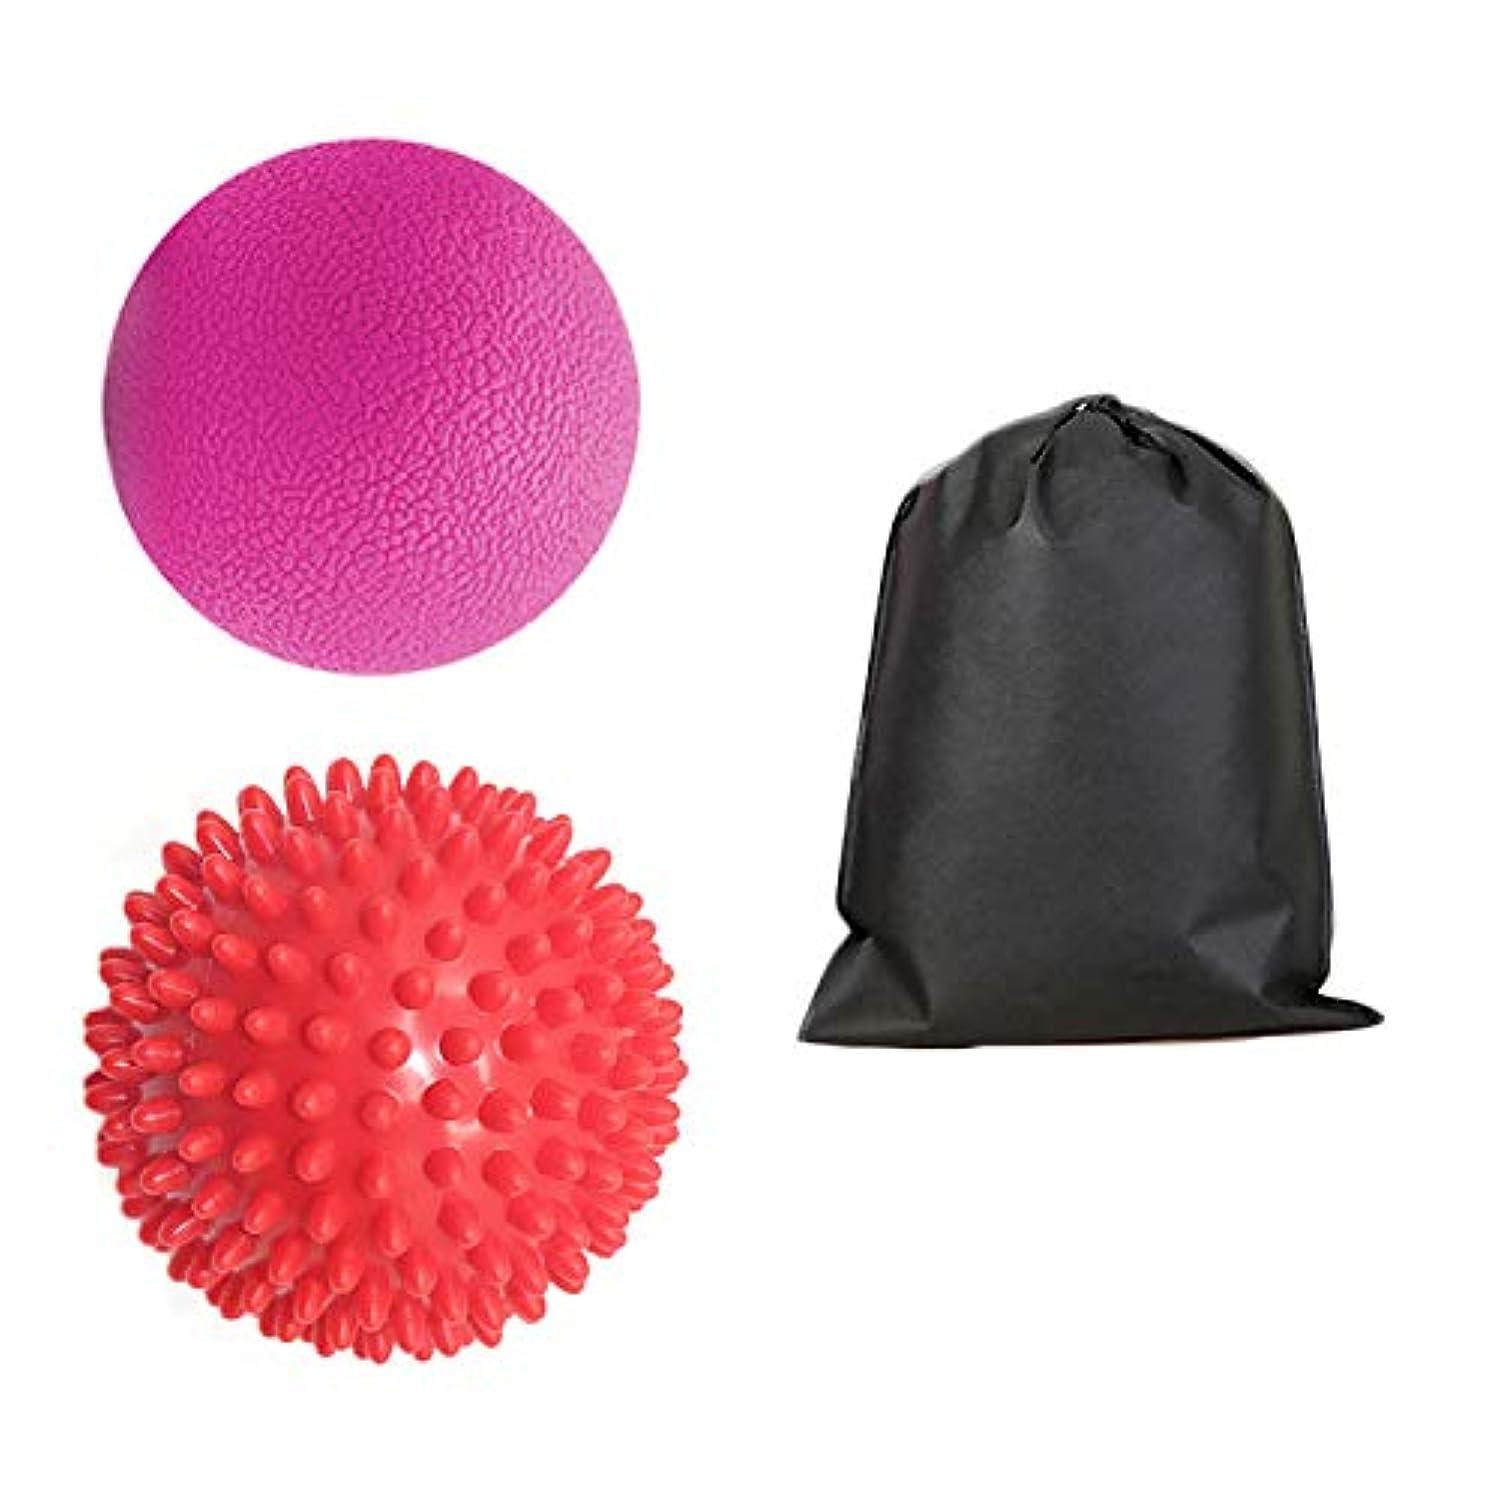 Migavan 1個マッサージボールマッサージボールローラーマッサージボール+ 1袋スパイクマッサージローラーボールマッサージと収納バッグ